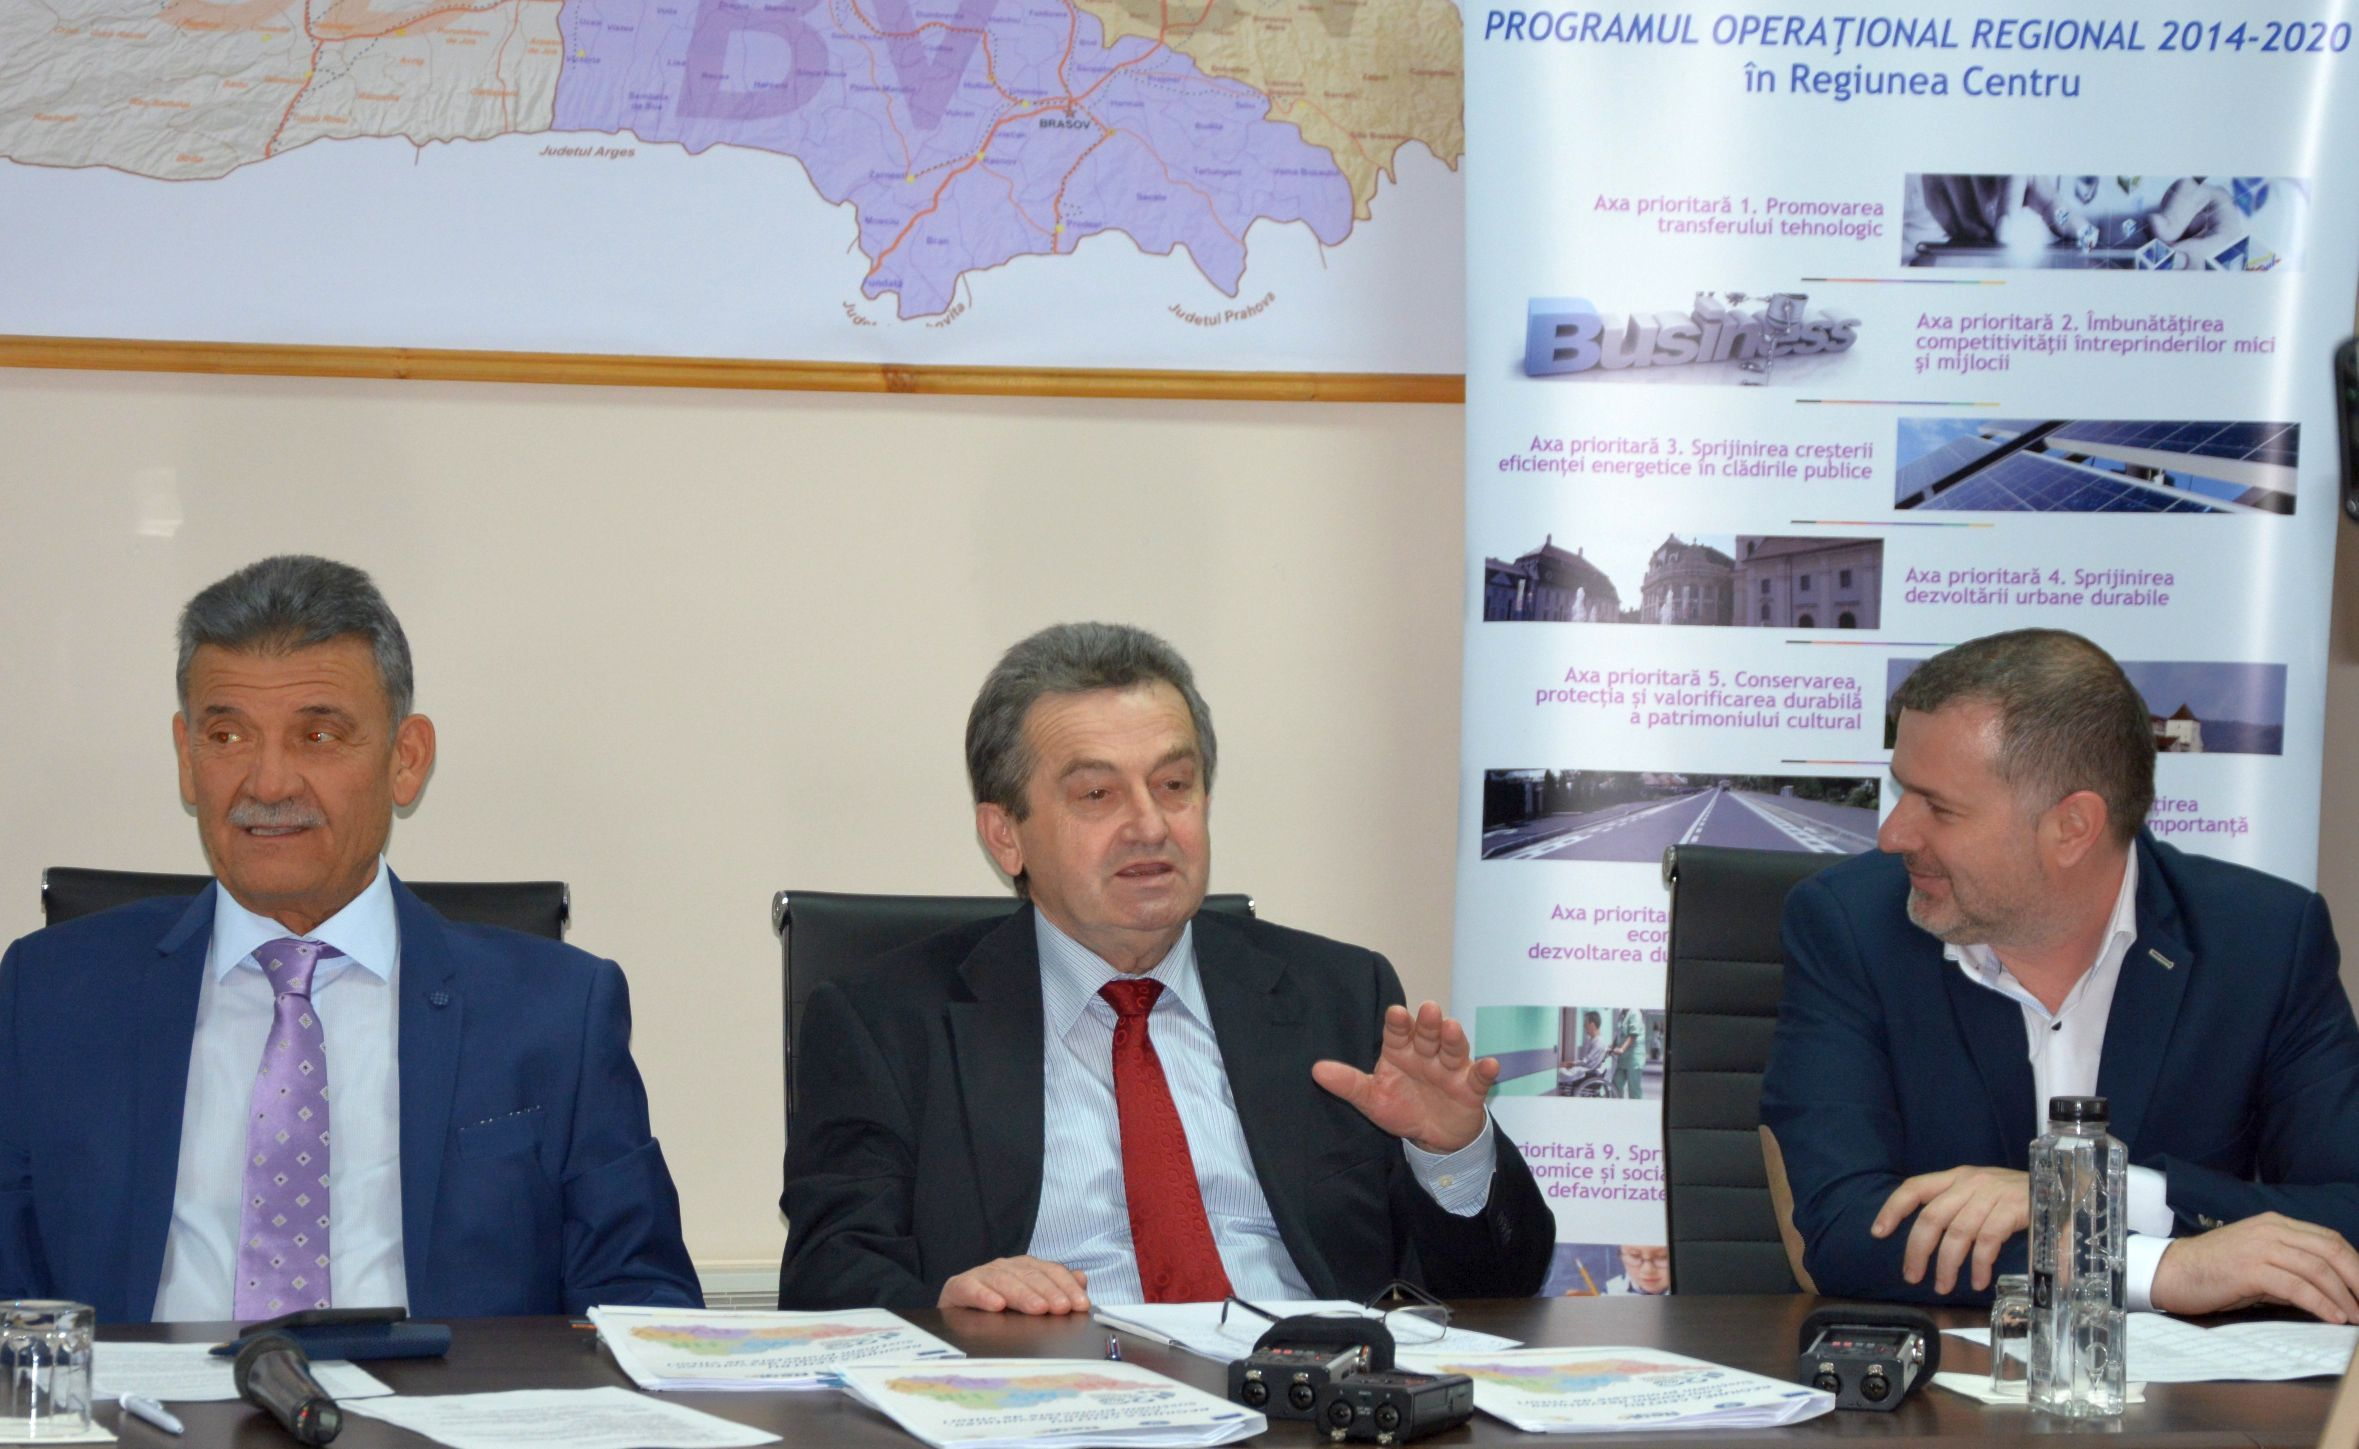 Peste 1200 de apartamente din Alba Iulia primesc fonduri nerambursabile pentru izolare termică (foto/video)